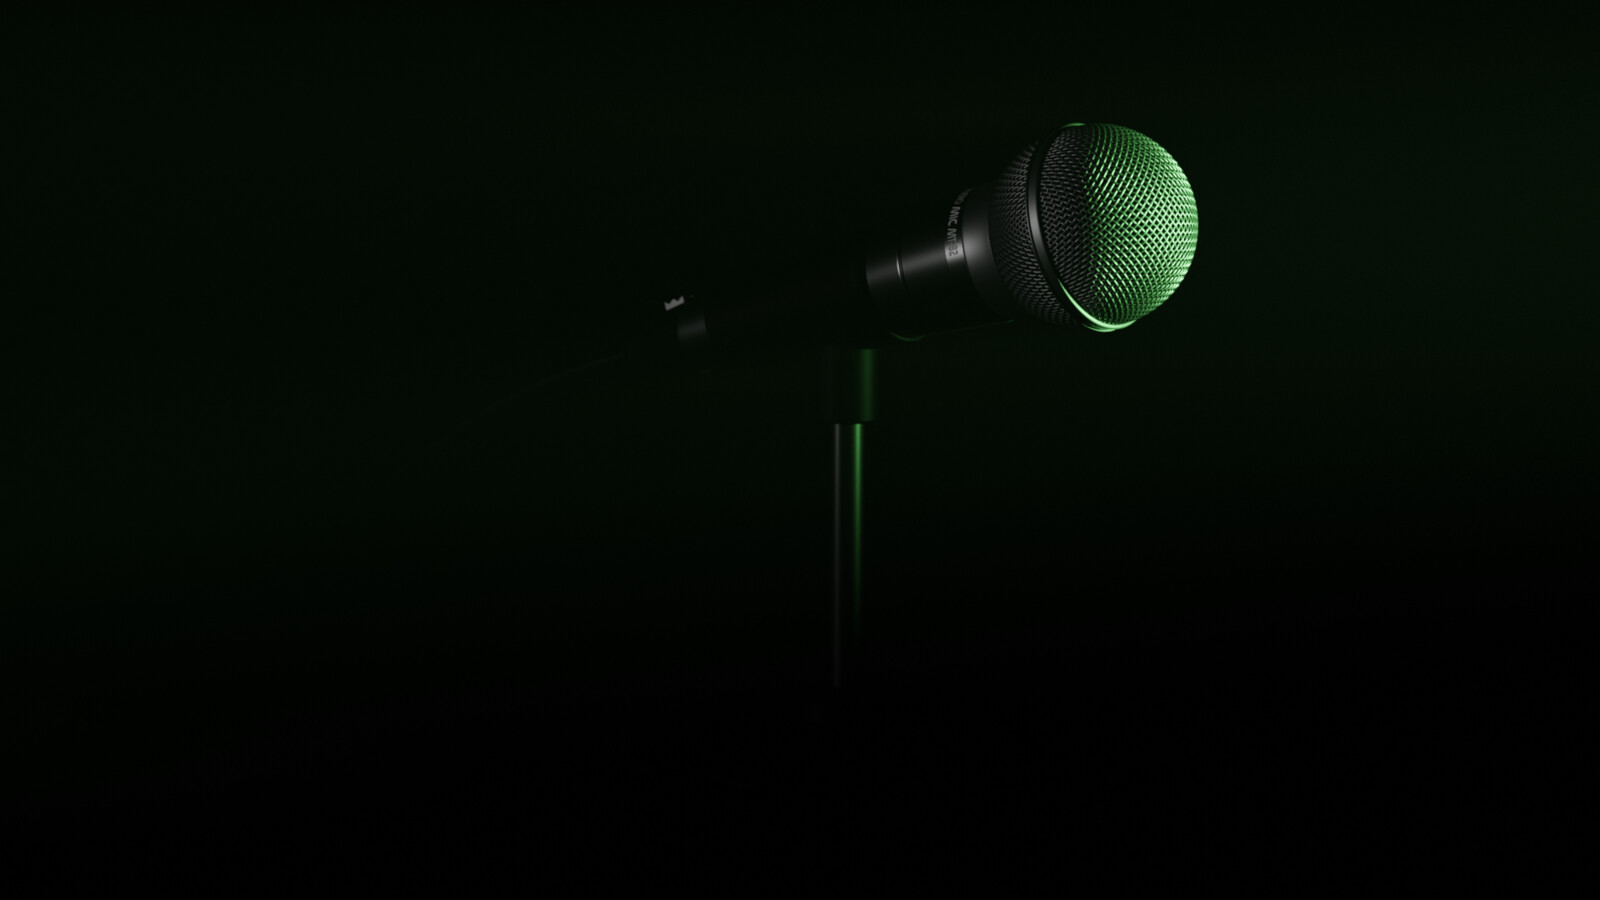 Microphone - 2 Lights